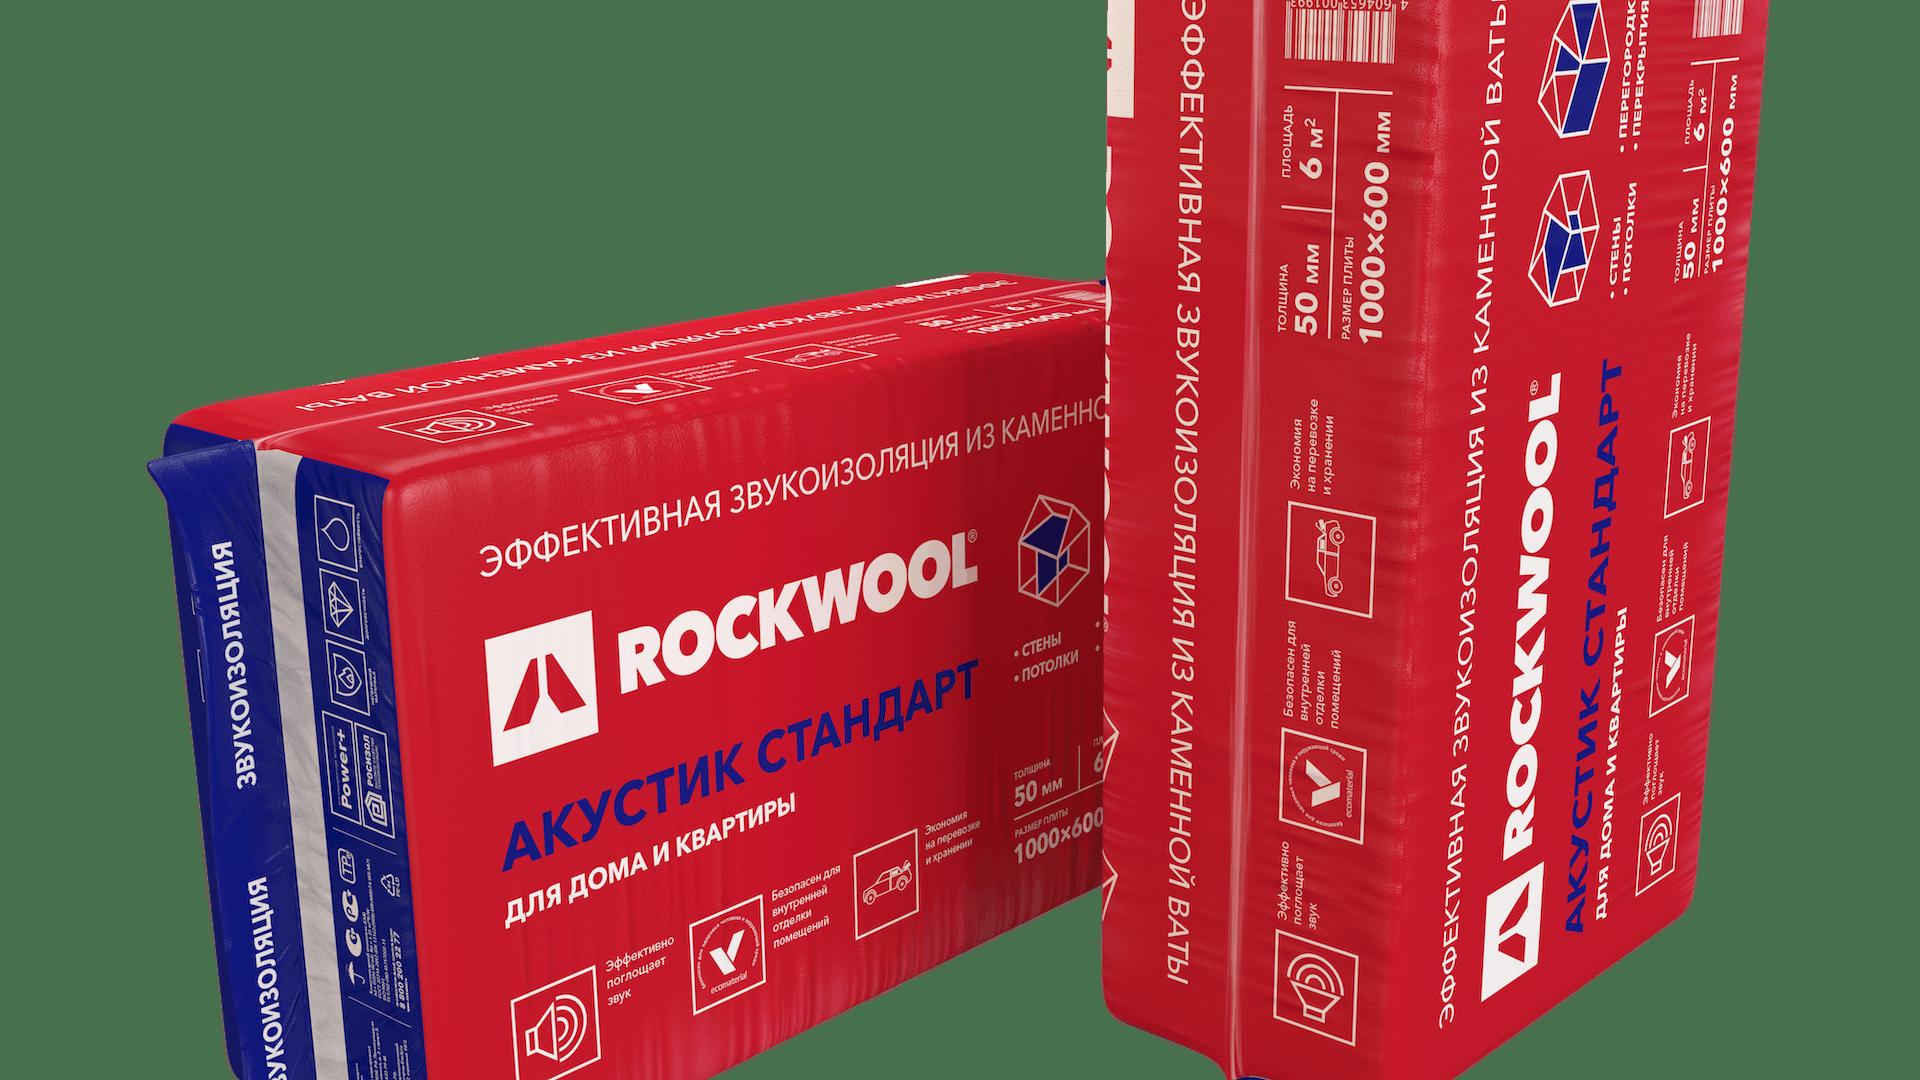 package, product, acoustik, rockwool acoustik standard